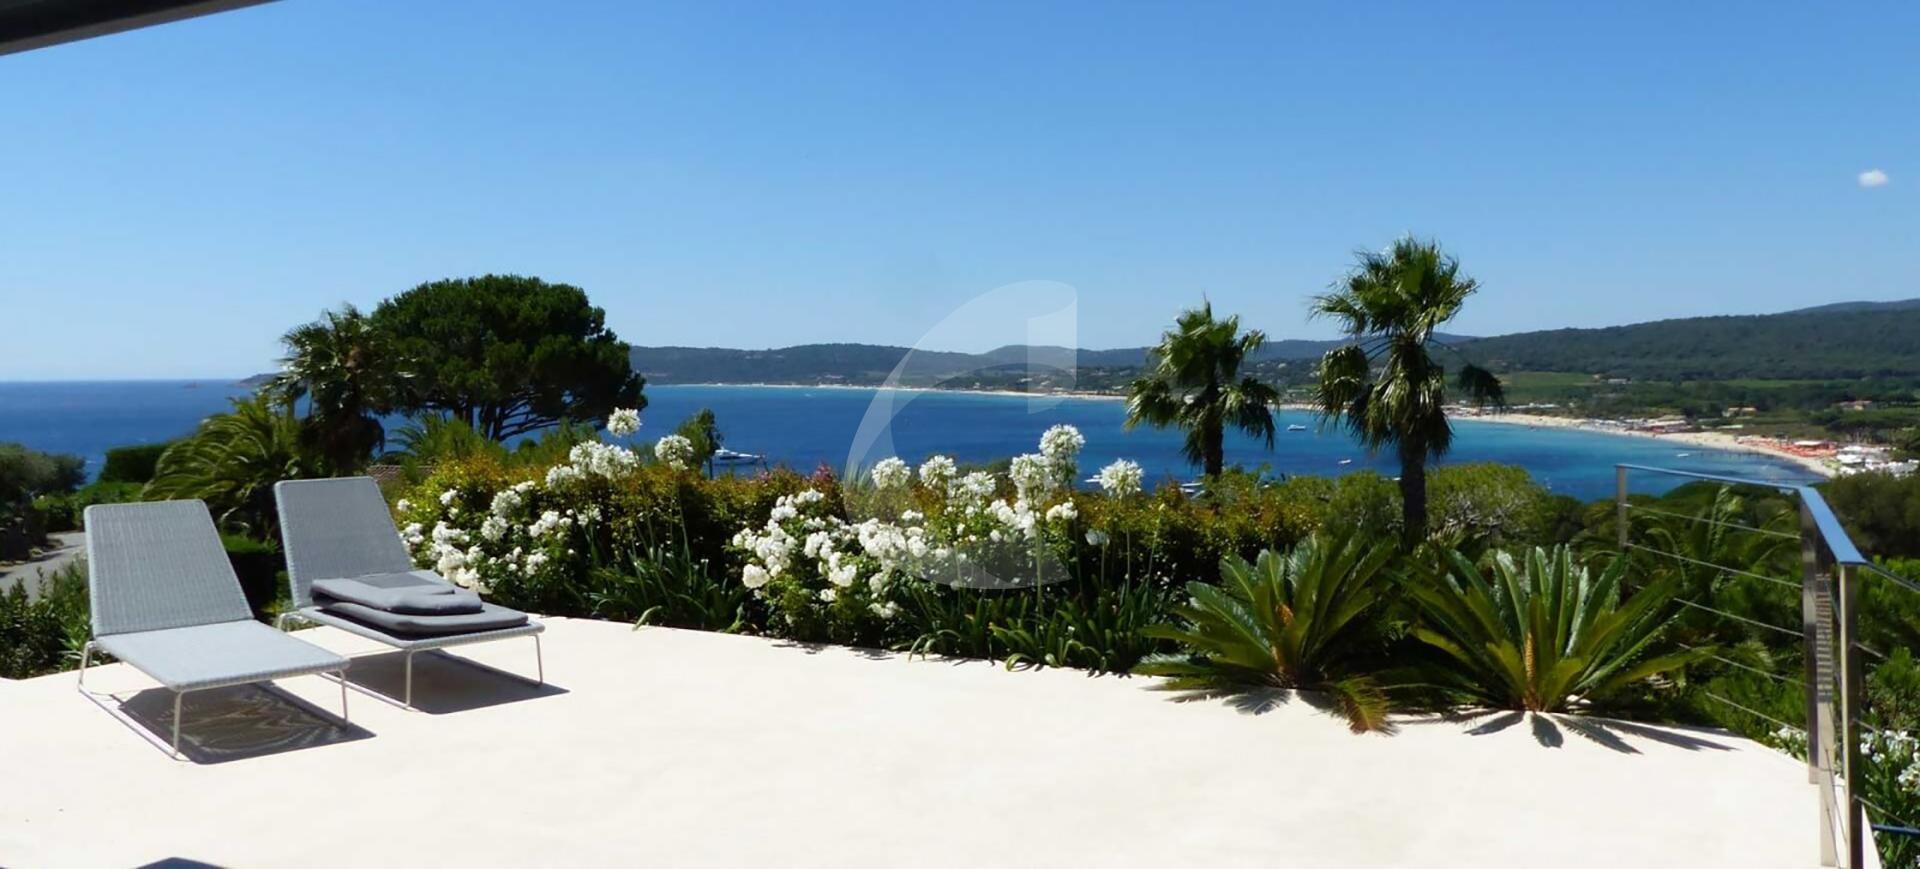 Villa rental Saint-Tropez Cap D'Azur